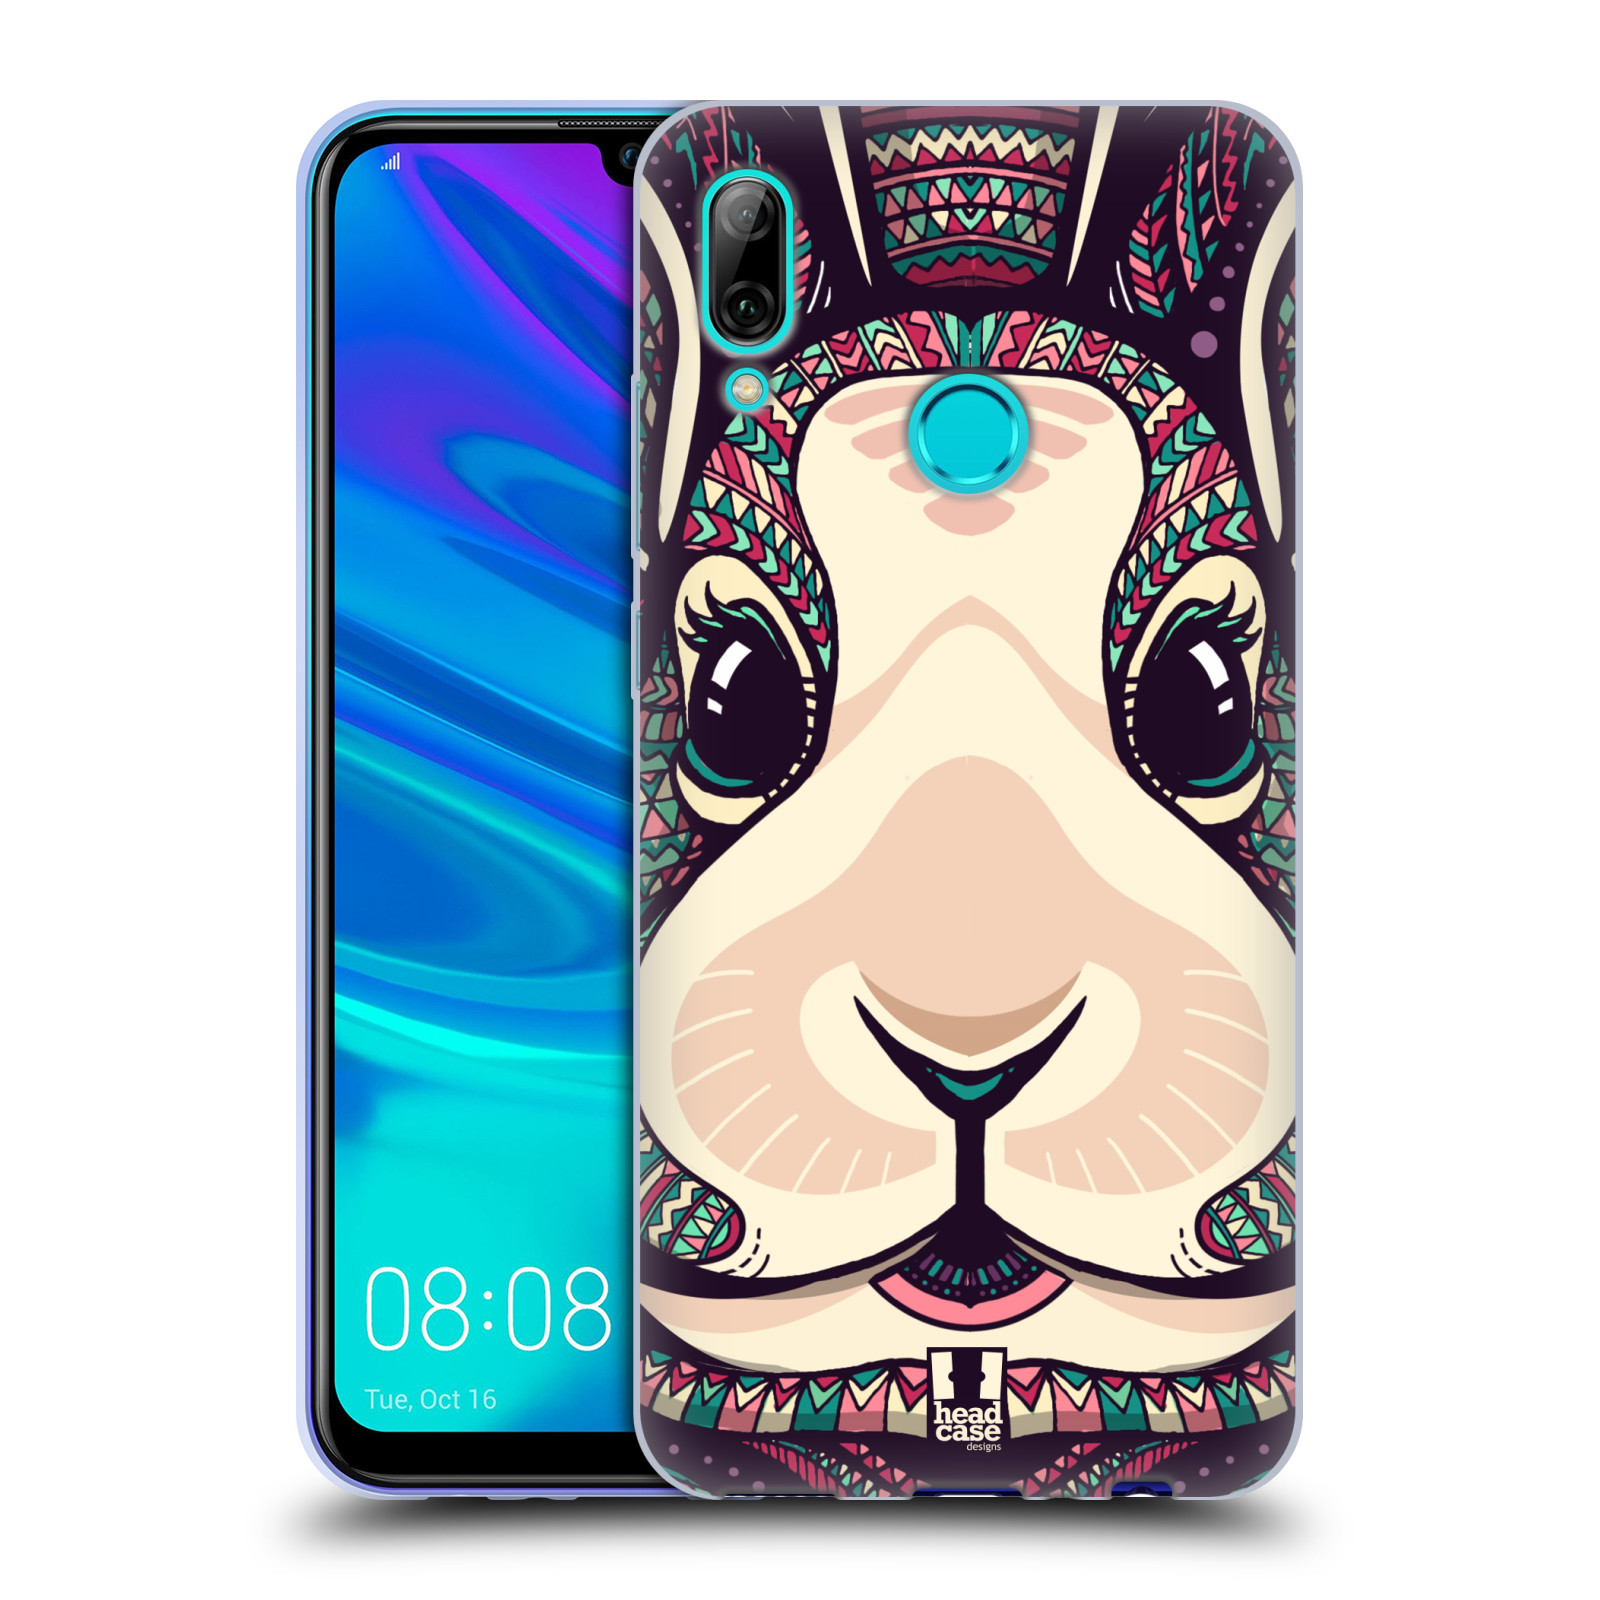 Silikonové pouzdro na mobil Honor 10 Lite - Head Case - AZTEC ZAJÍČEK